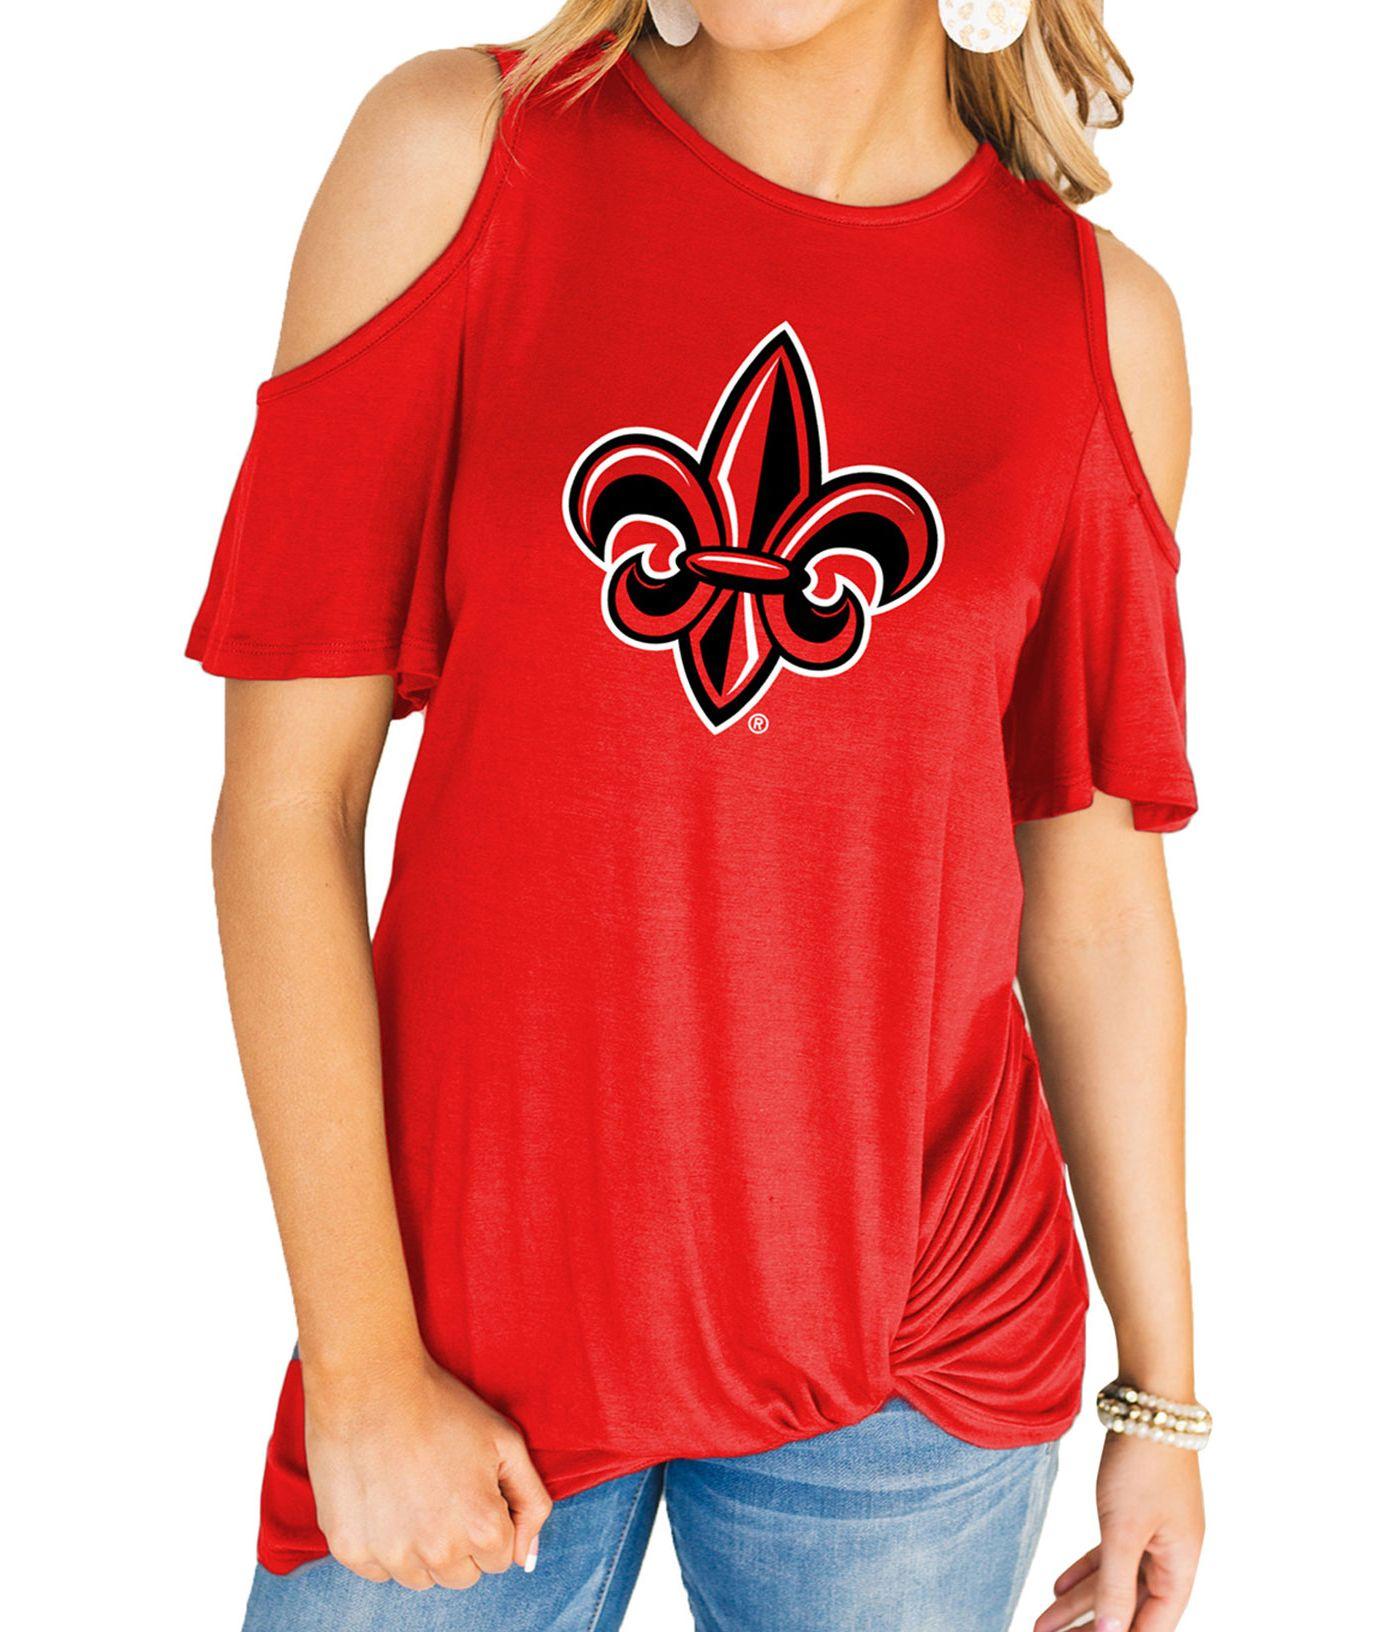 Gameday Couture Women's Louisiana-Lafayette Ragin' Cajuns Red Alma Mater Cold Shoulder T-Shirt